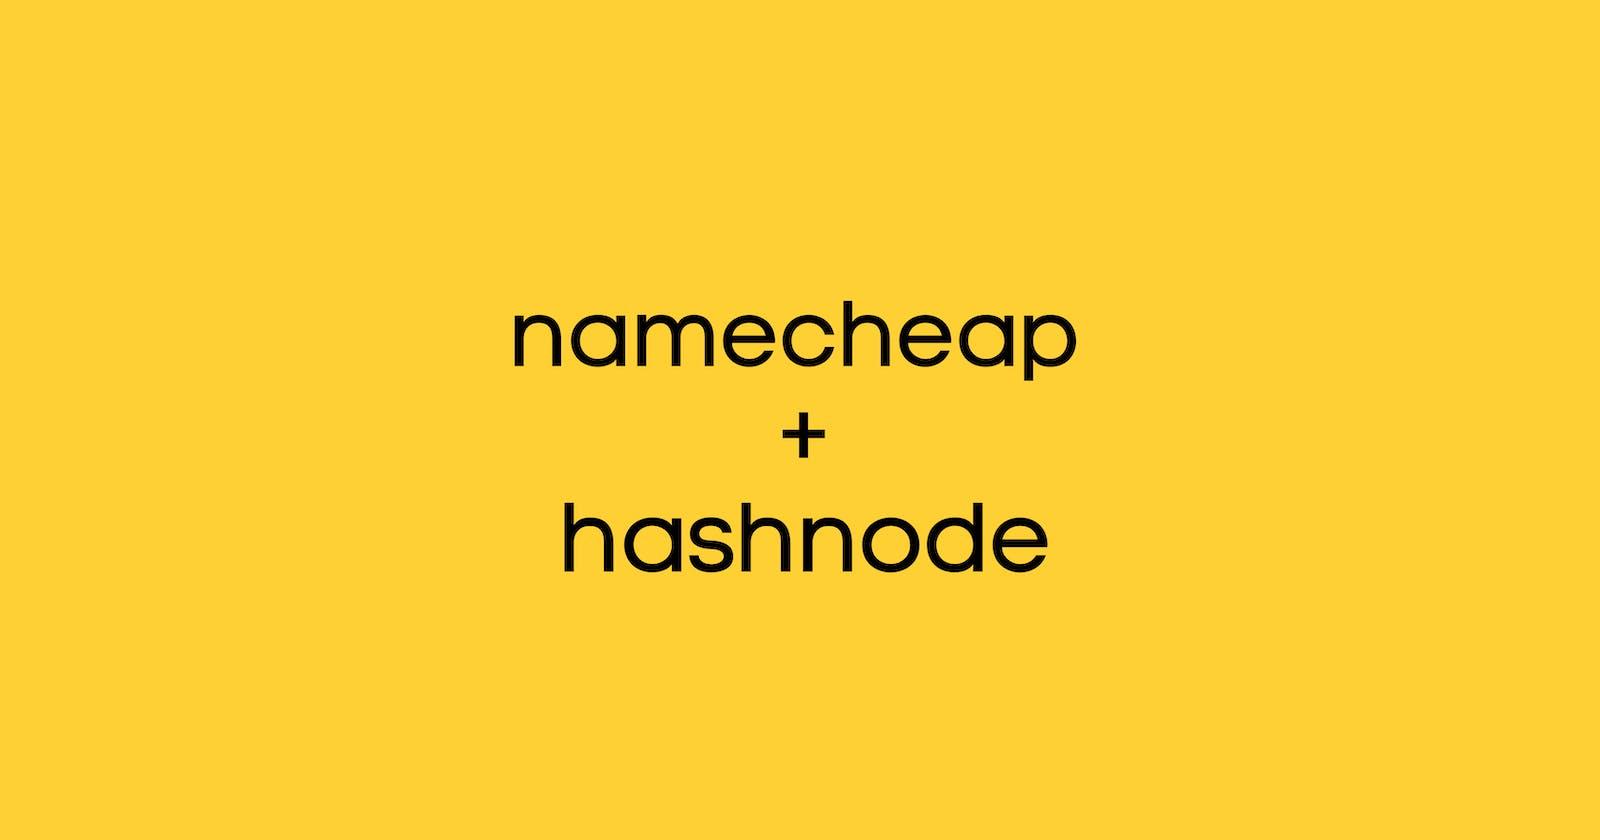 Integrate your namecheap custom domain with hashnode